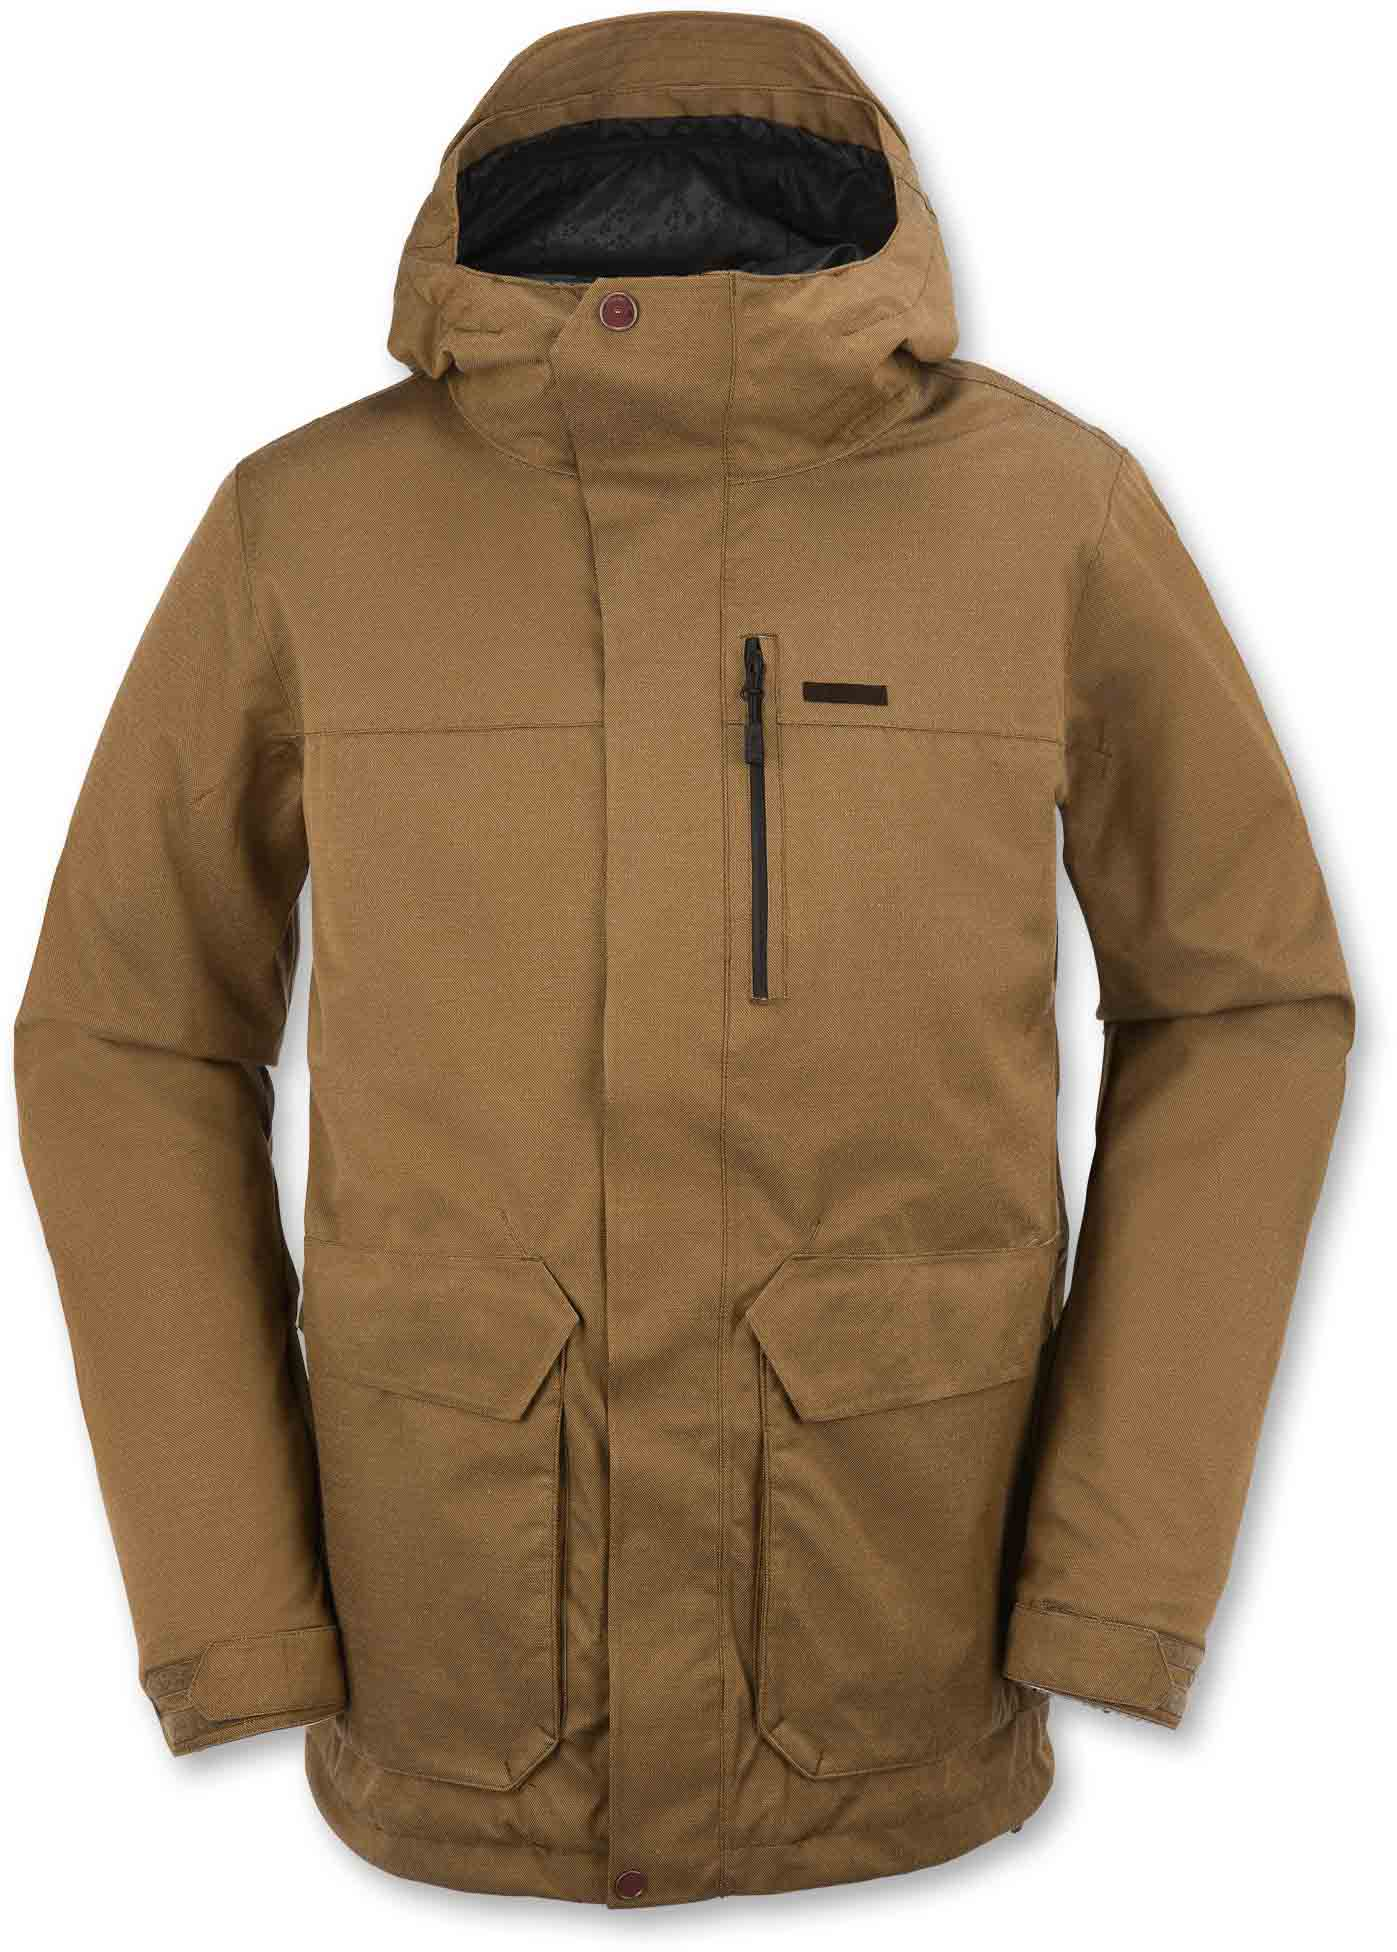 image volcom-lido-jacket-caramel-jpg